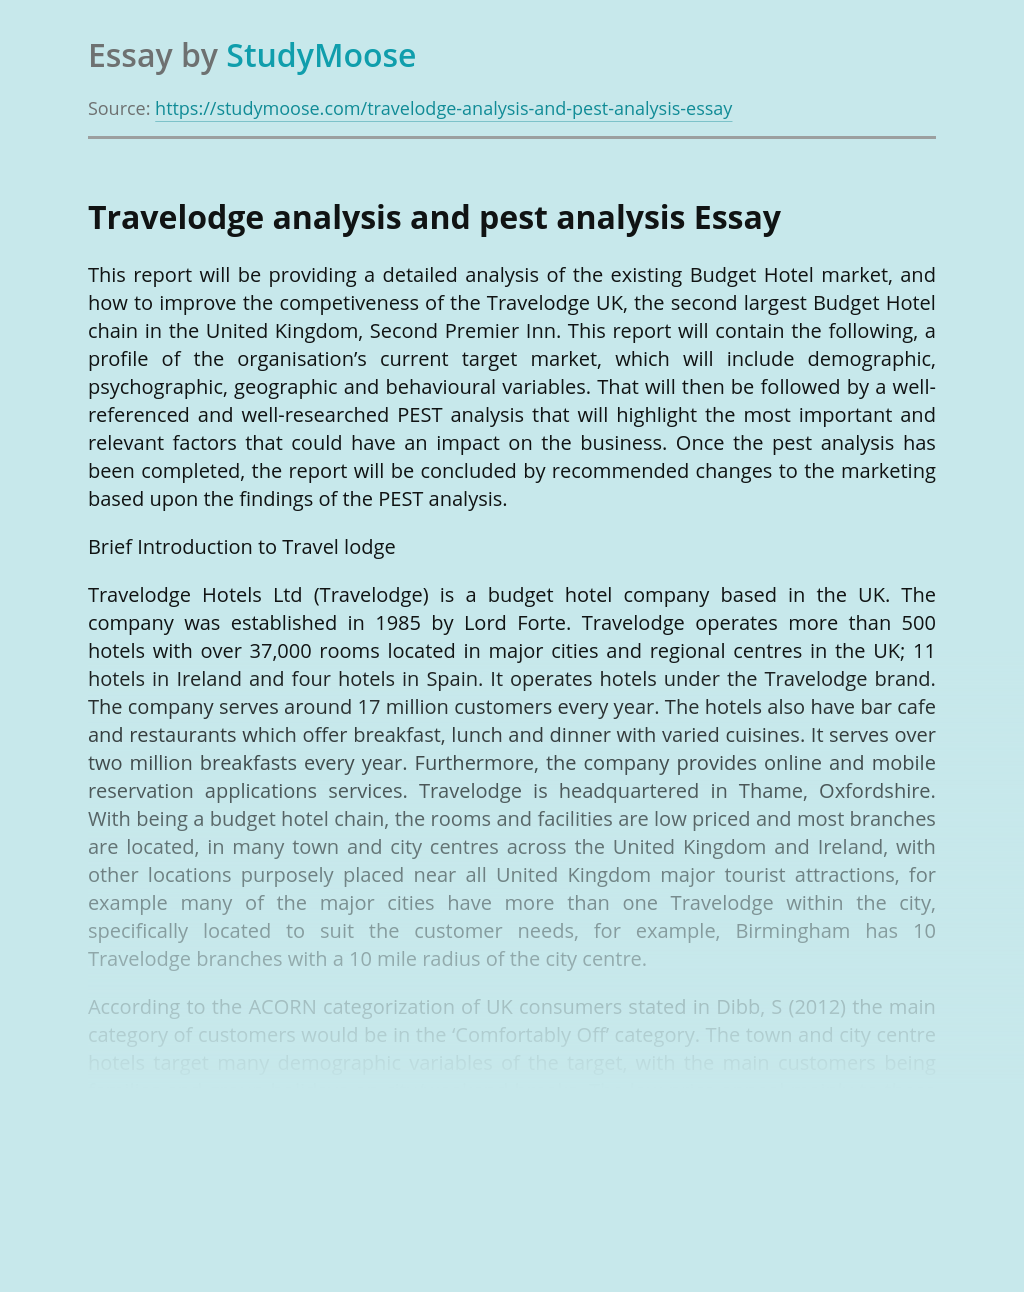 Travelodge Company PEST Analysis